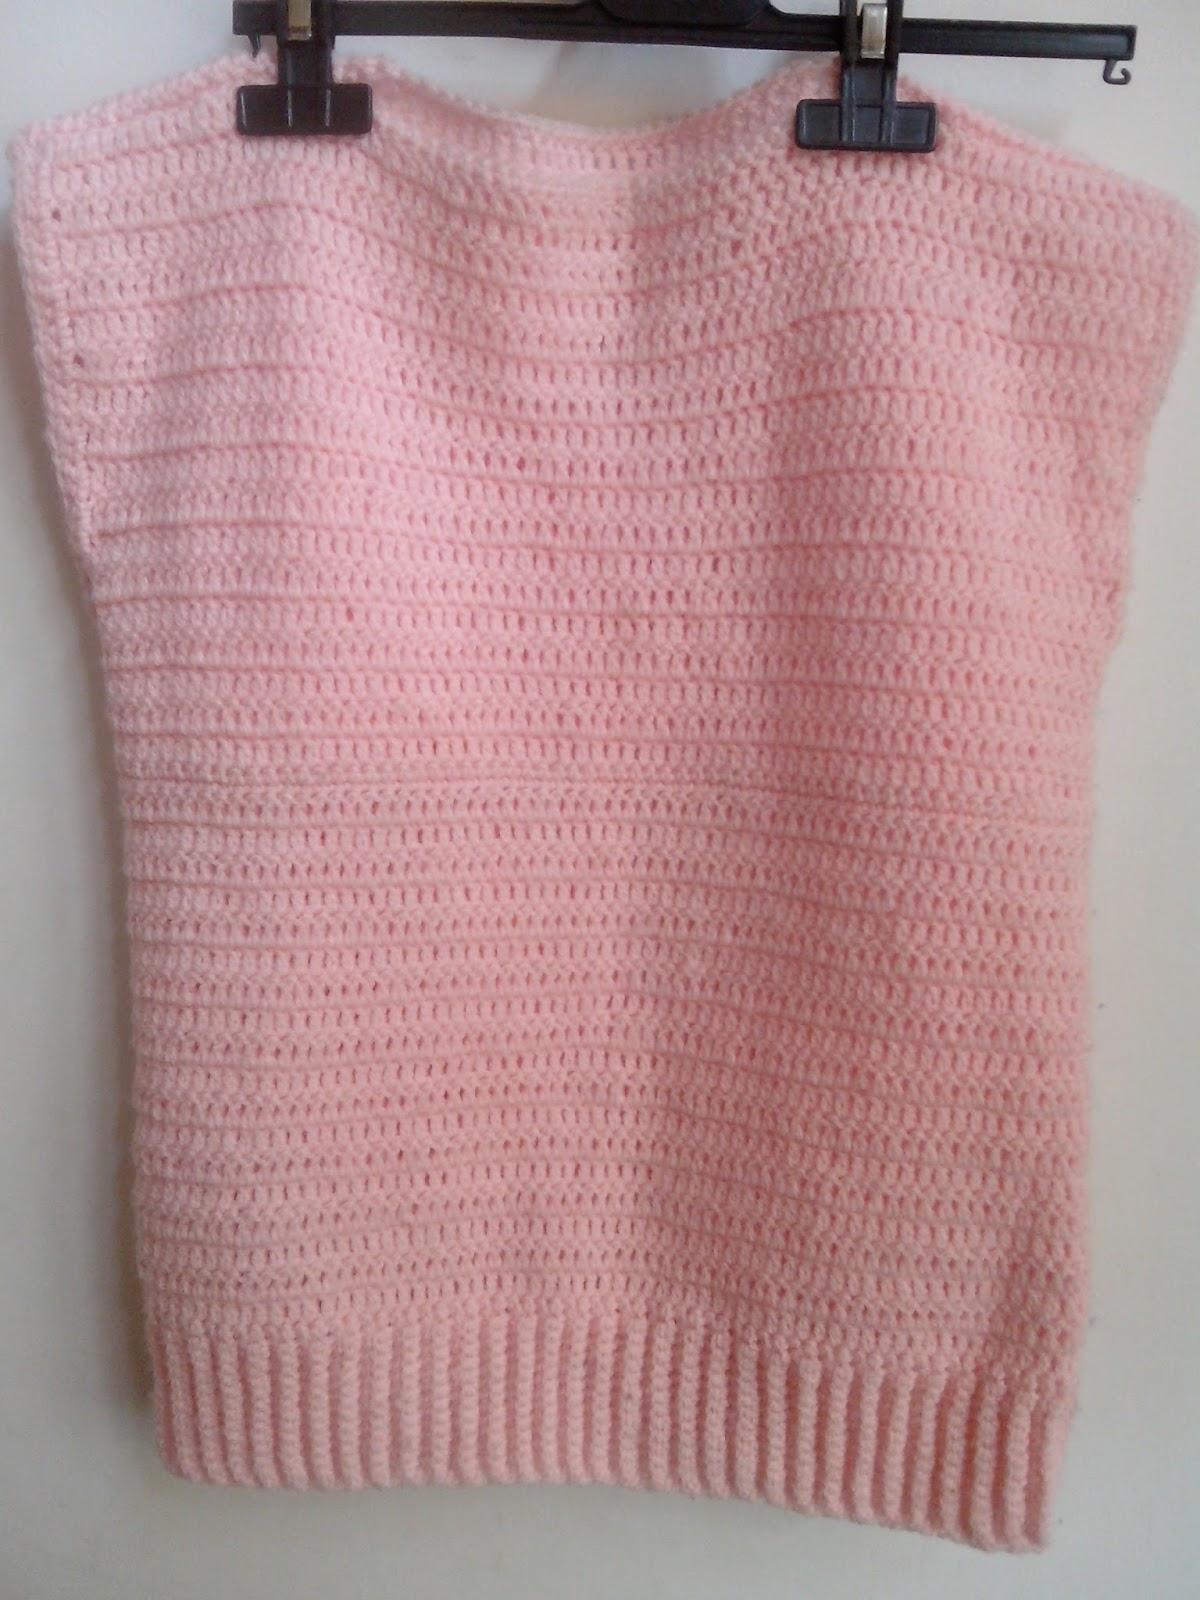 Lunivers Darmelle Tuto Pull Enfant Au Crochet Taille 910 Ans